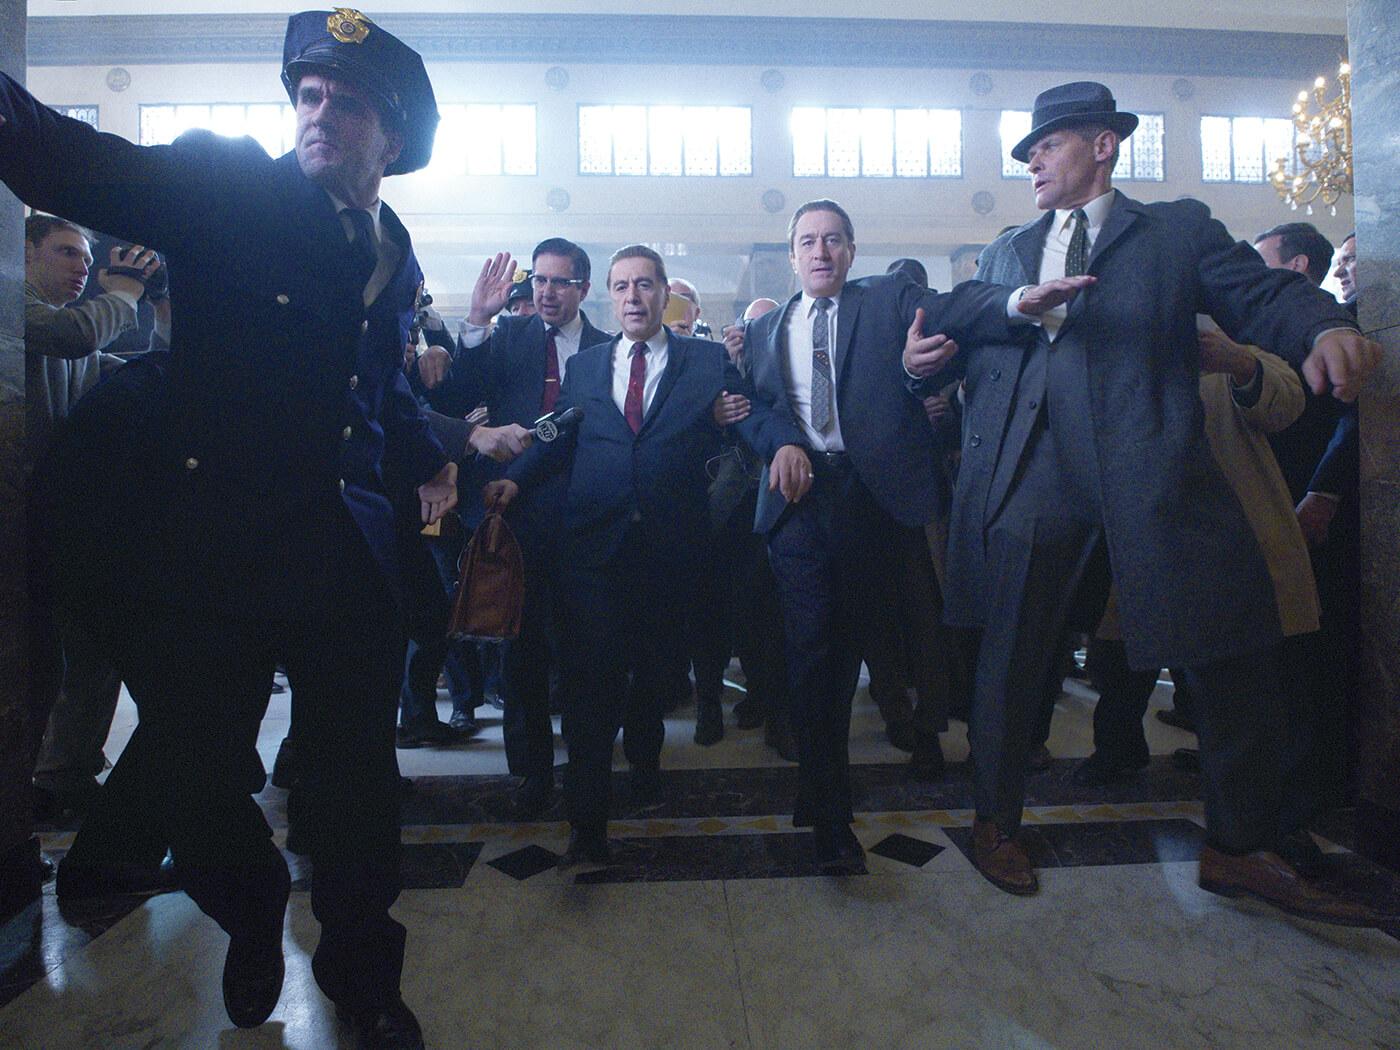 The Irishman - UNCUT